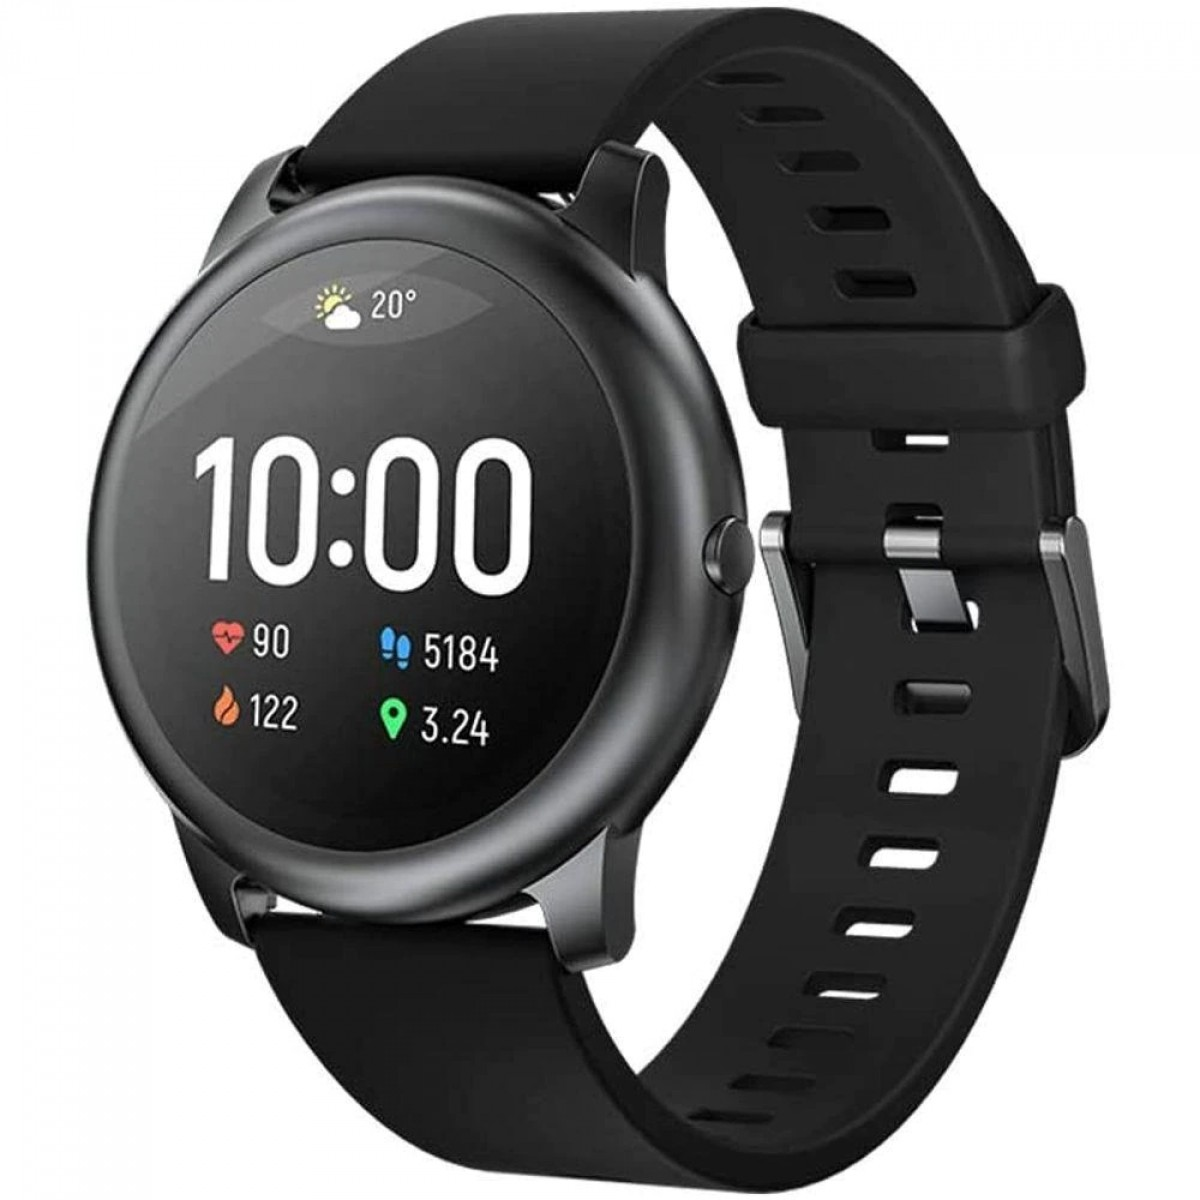 Relógio Smartwatch Xiaomi, Haylou Solar LS05, Bluetooth, Black